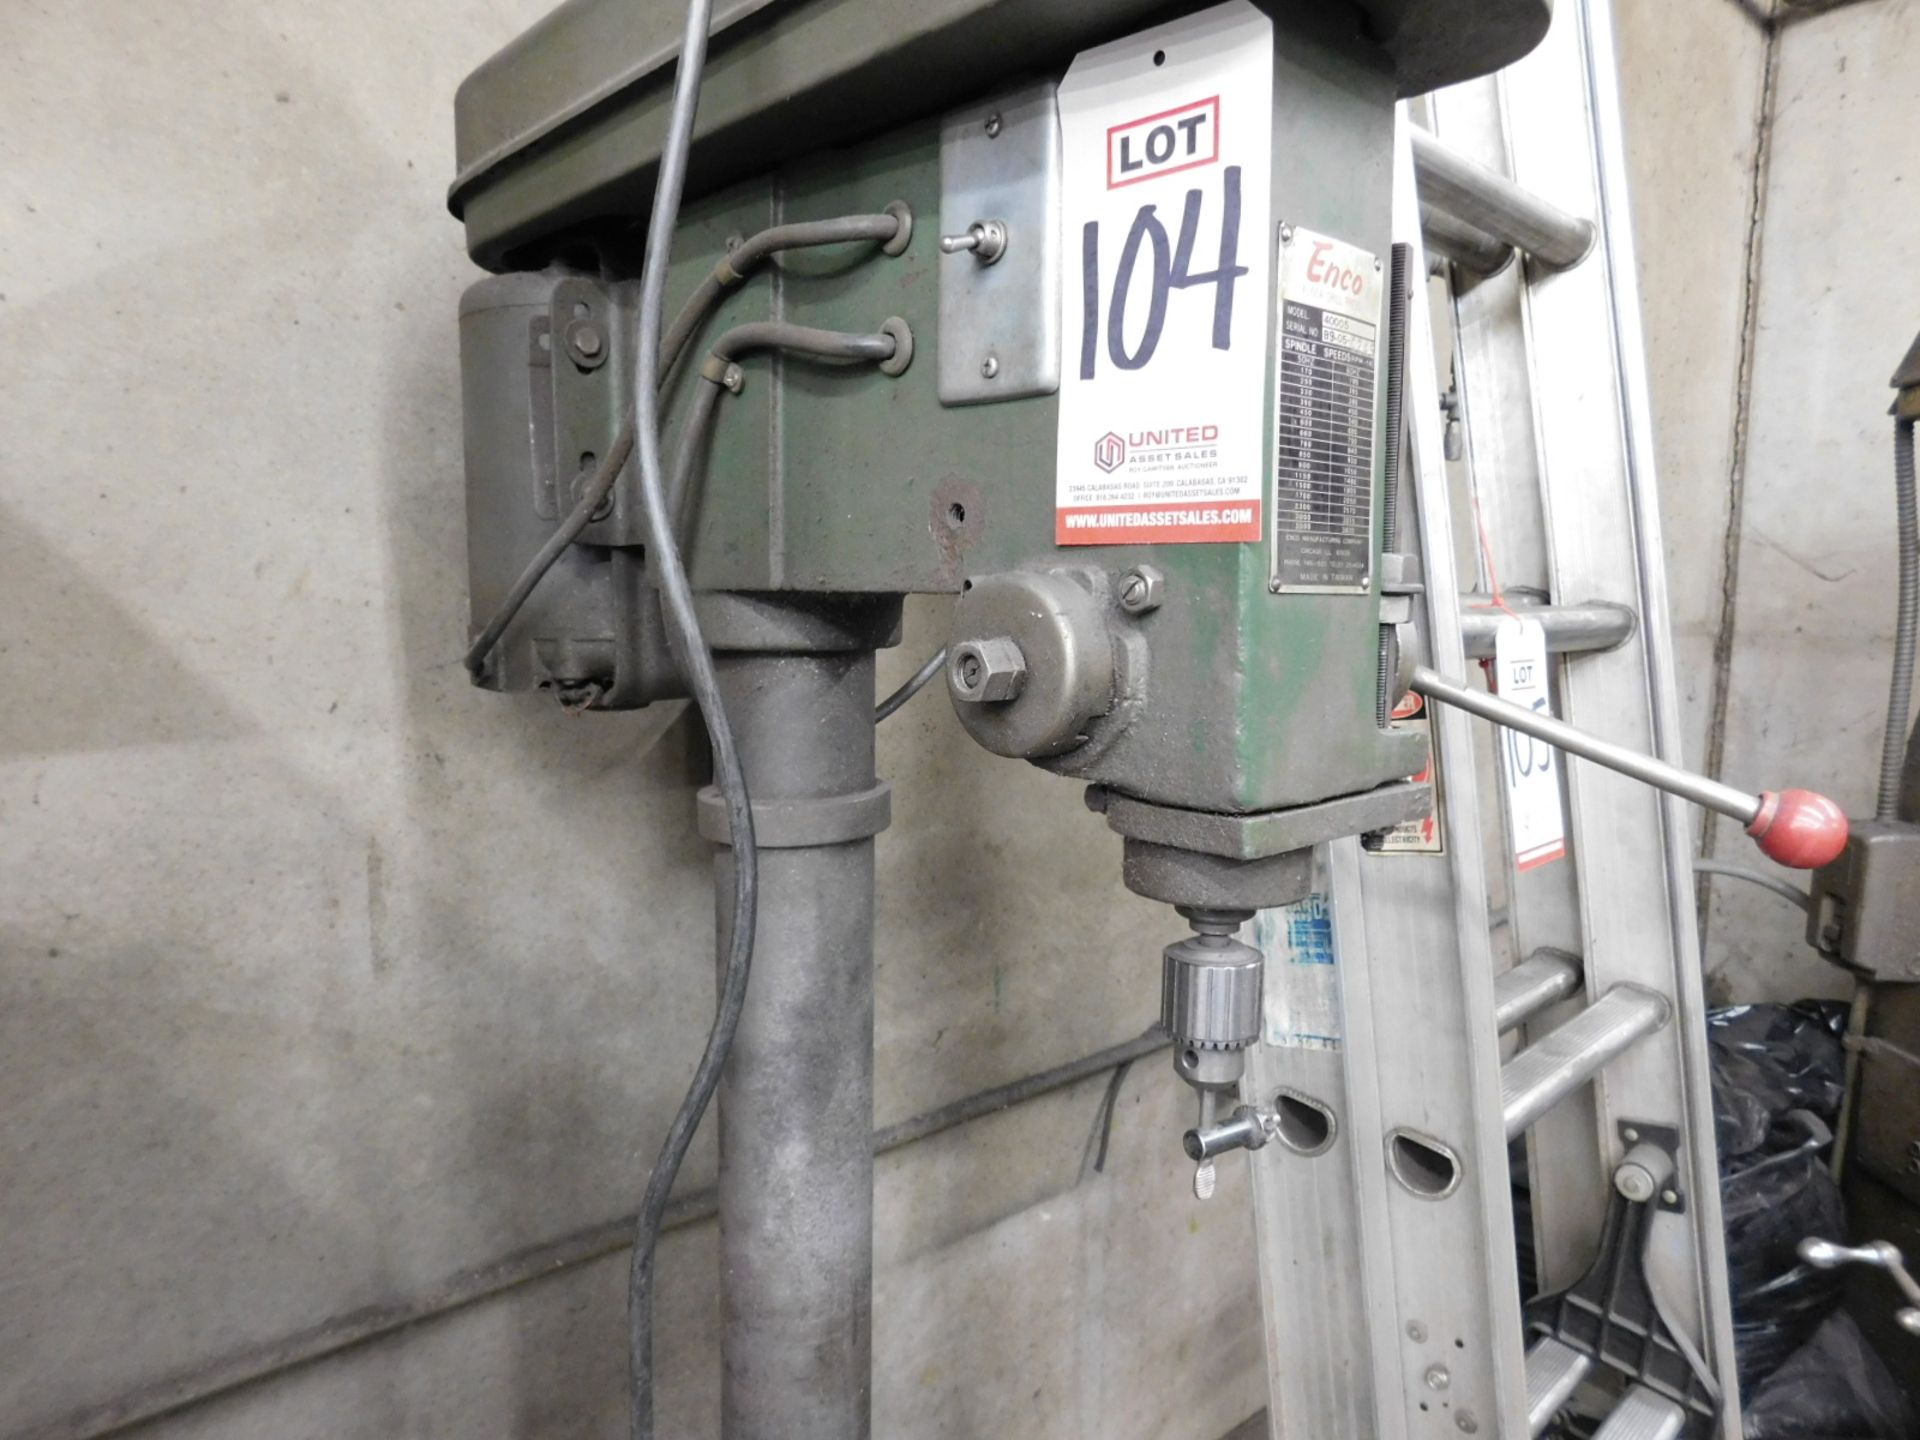 "ENCO 17"" FLOOR DRILL PRESS, MODEL 40005 - Image 2 of 4"